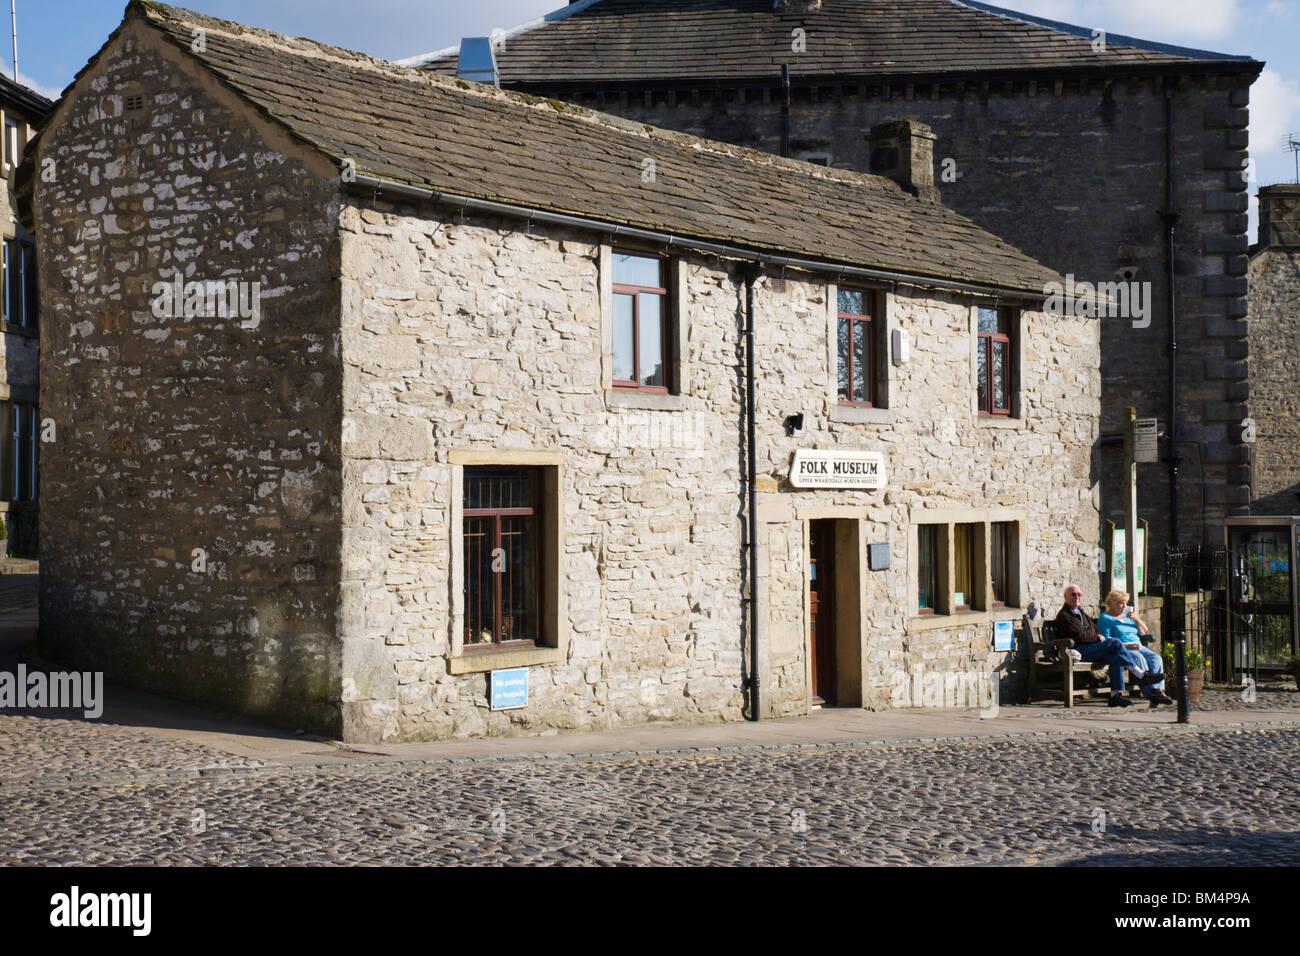 The Folk Museum in Grassington village, North Yorkshire, England. Stock Photo